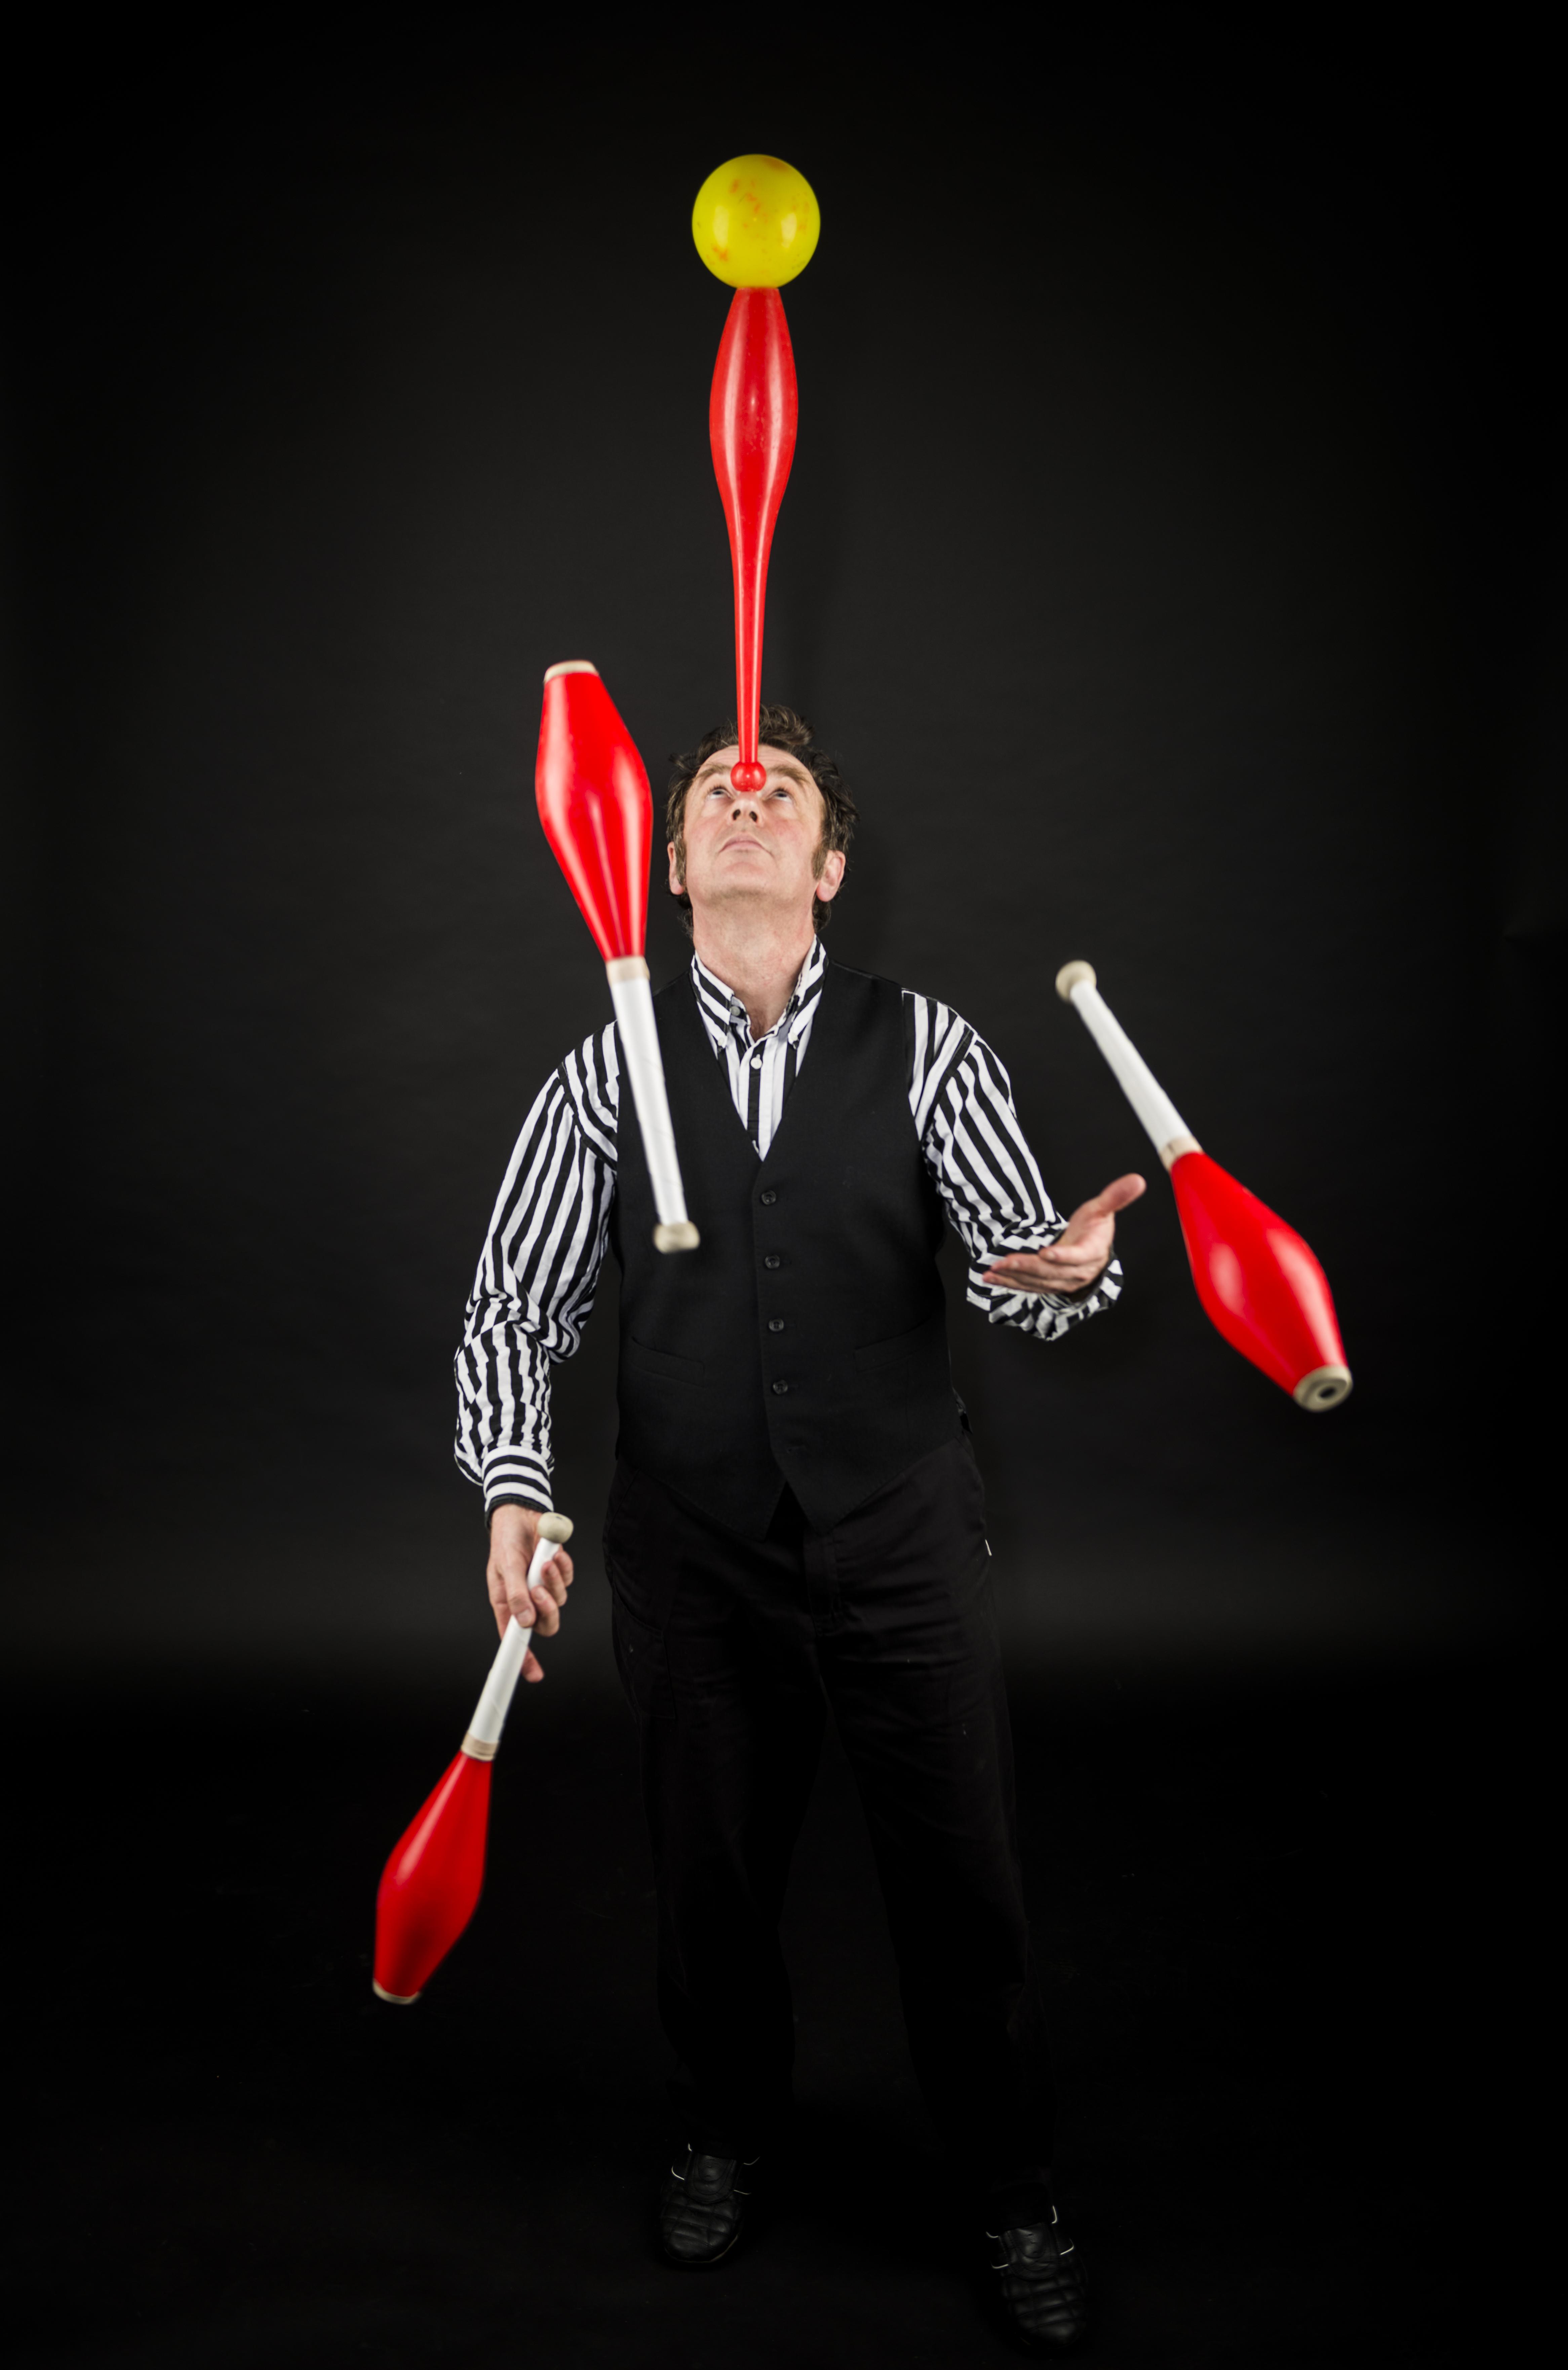 Ben the Juggler